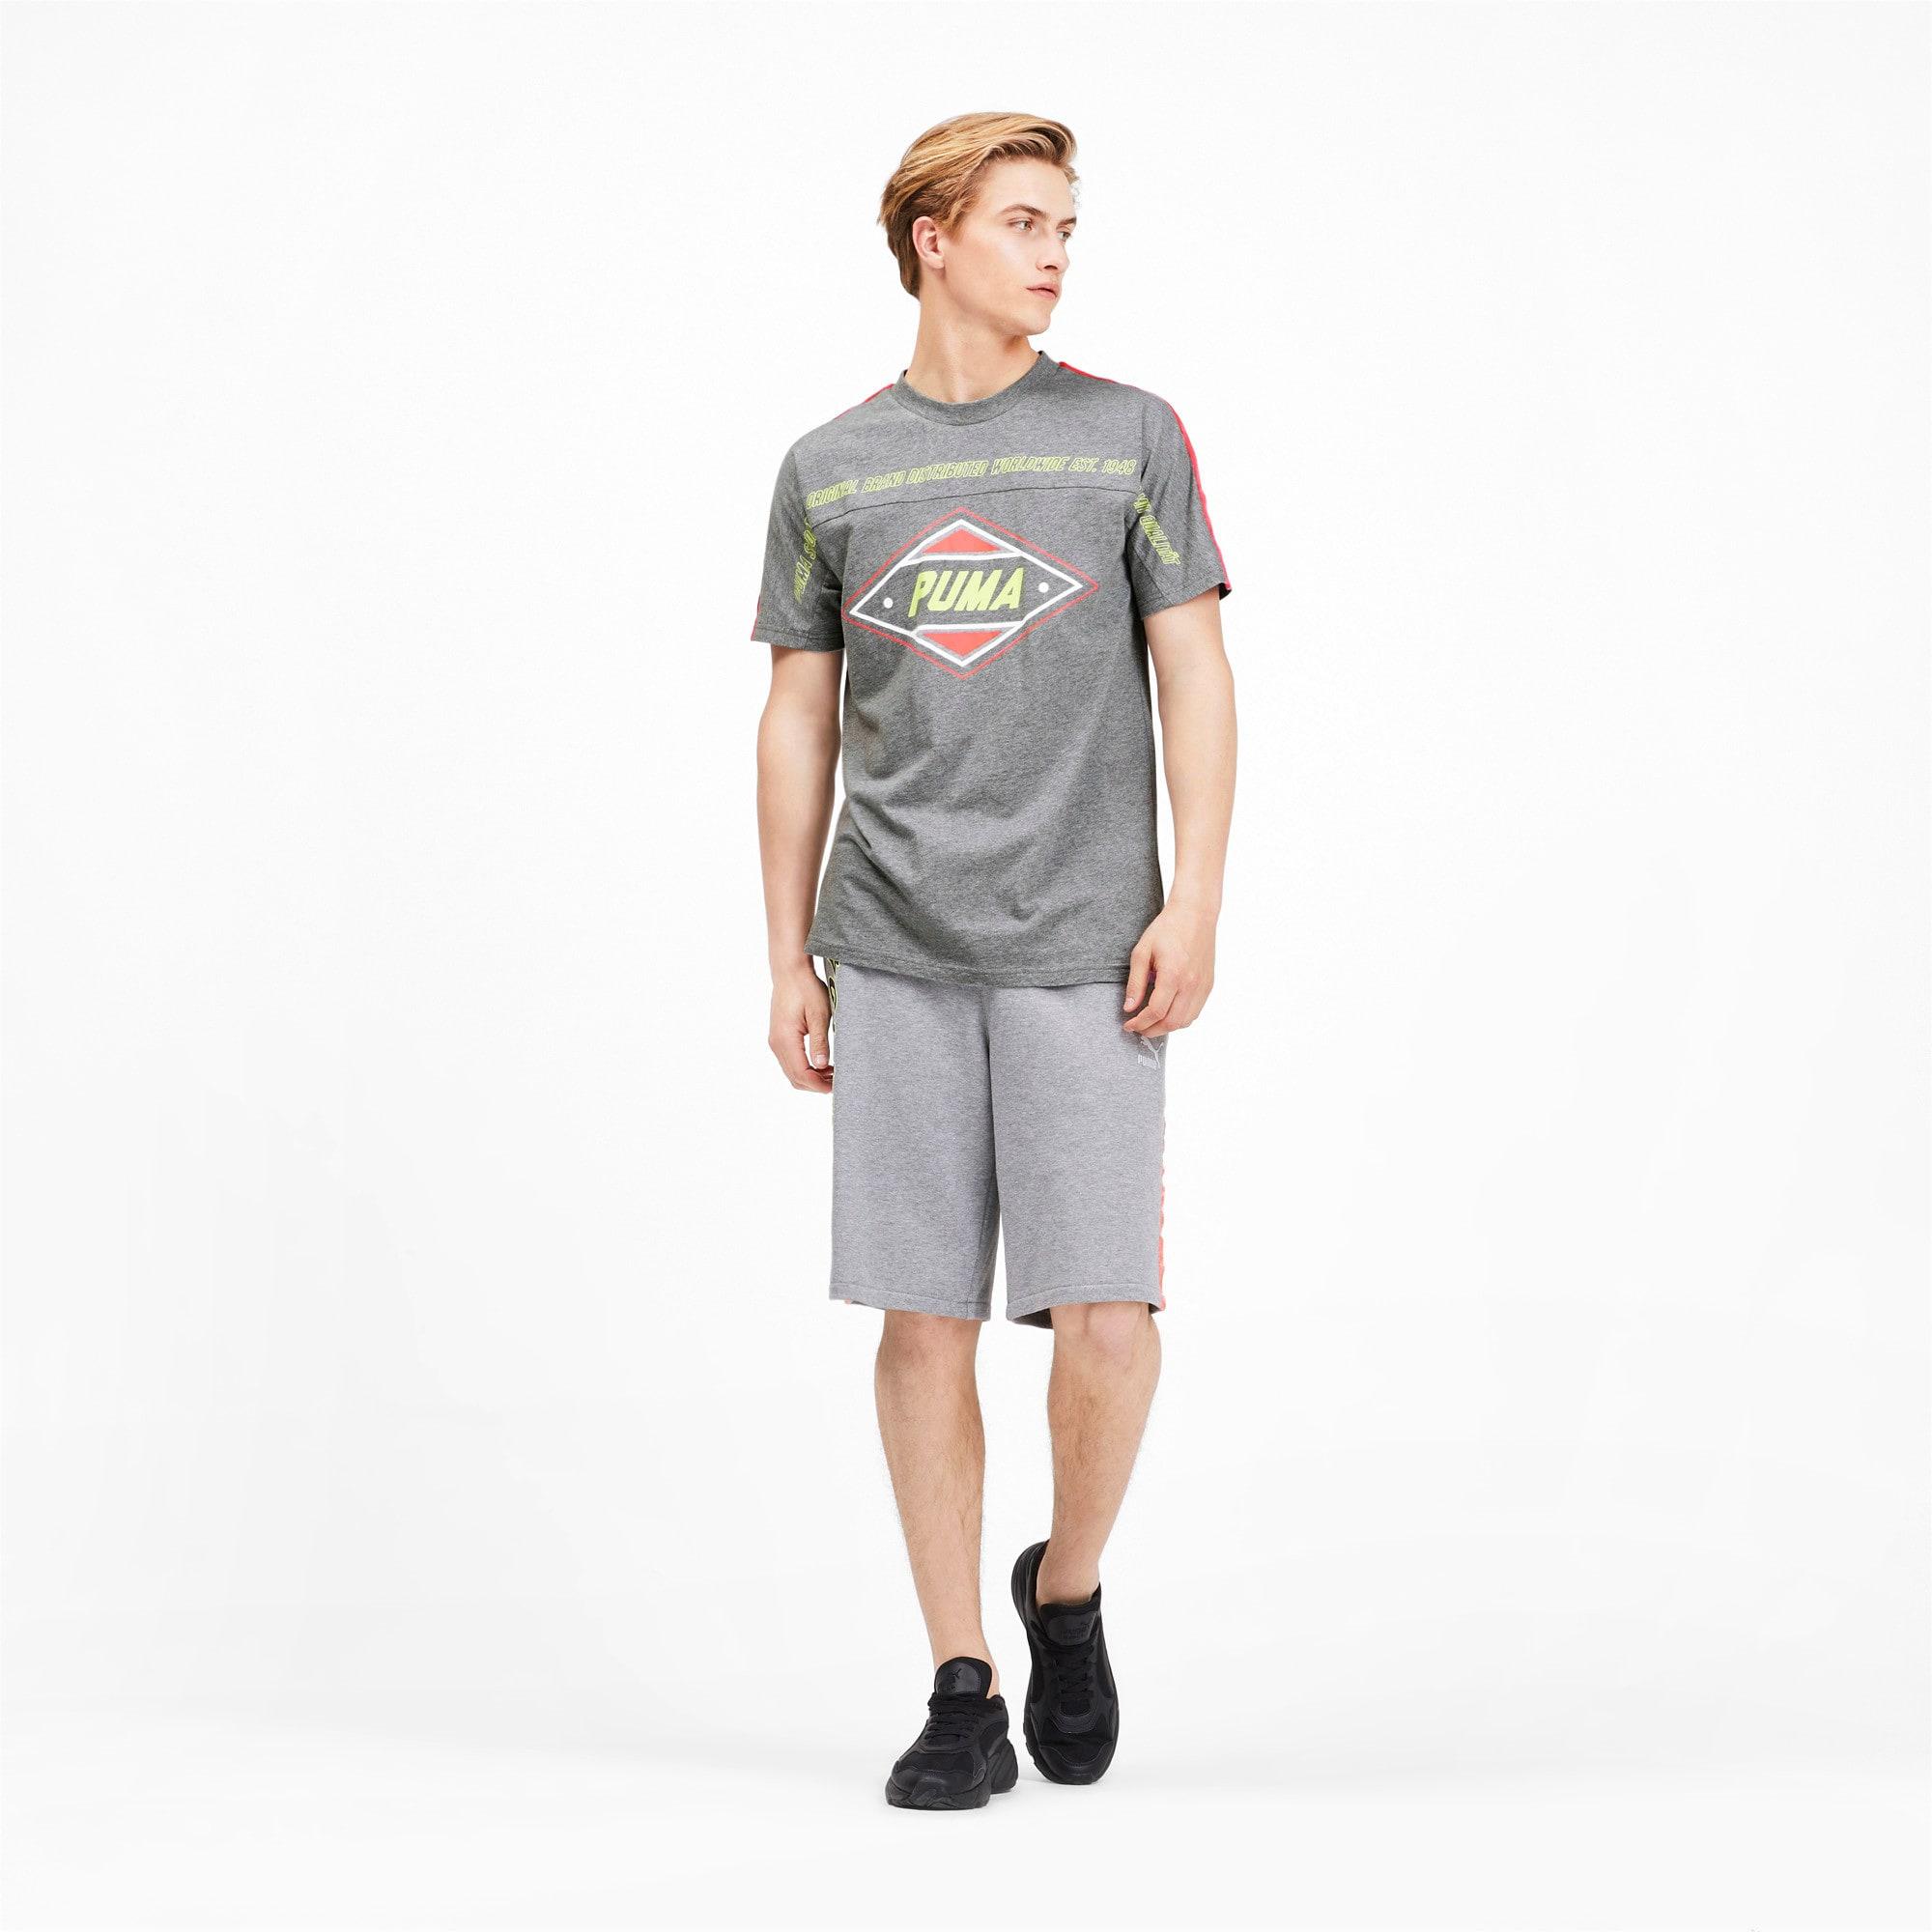 Miniatura 3 de Camiseta luXTG para hombre, Medium Gray Heather, mediano